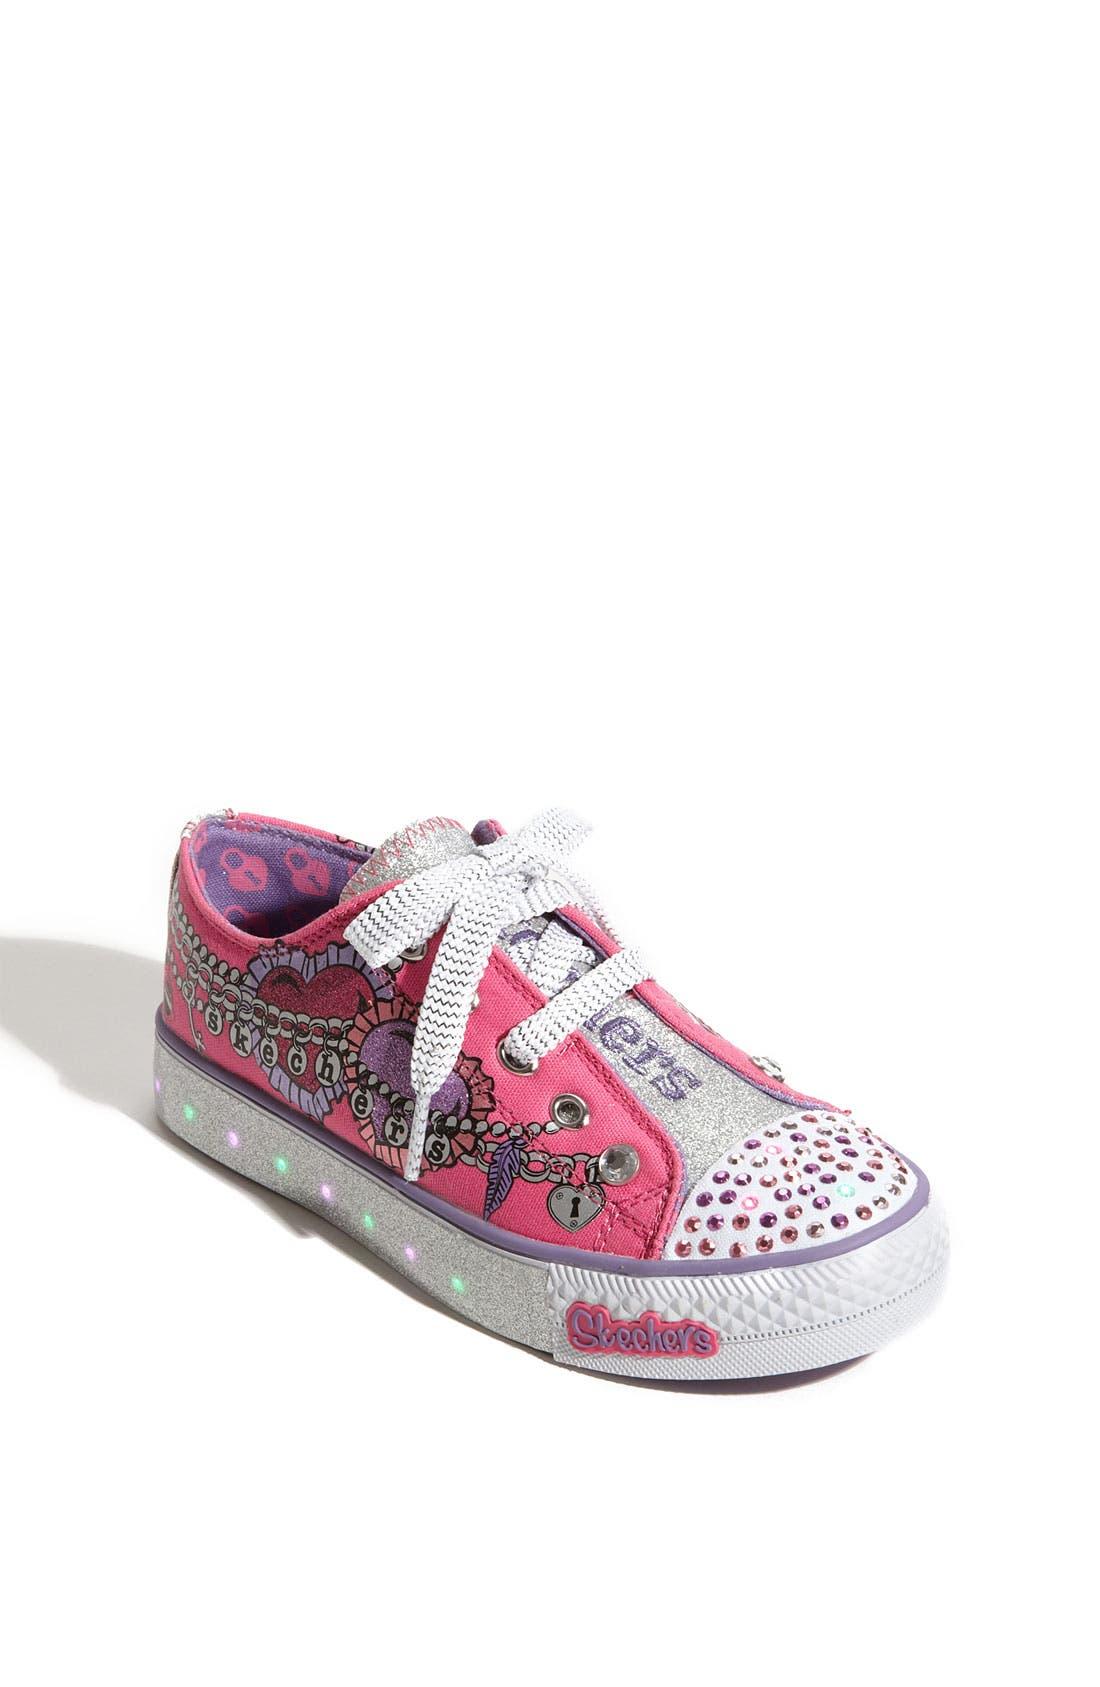 Main Image - SKECHERS 'Peekaboo - Dream Jumper' Sneaker (Toddler, Little Kid & Big Kid)